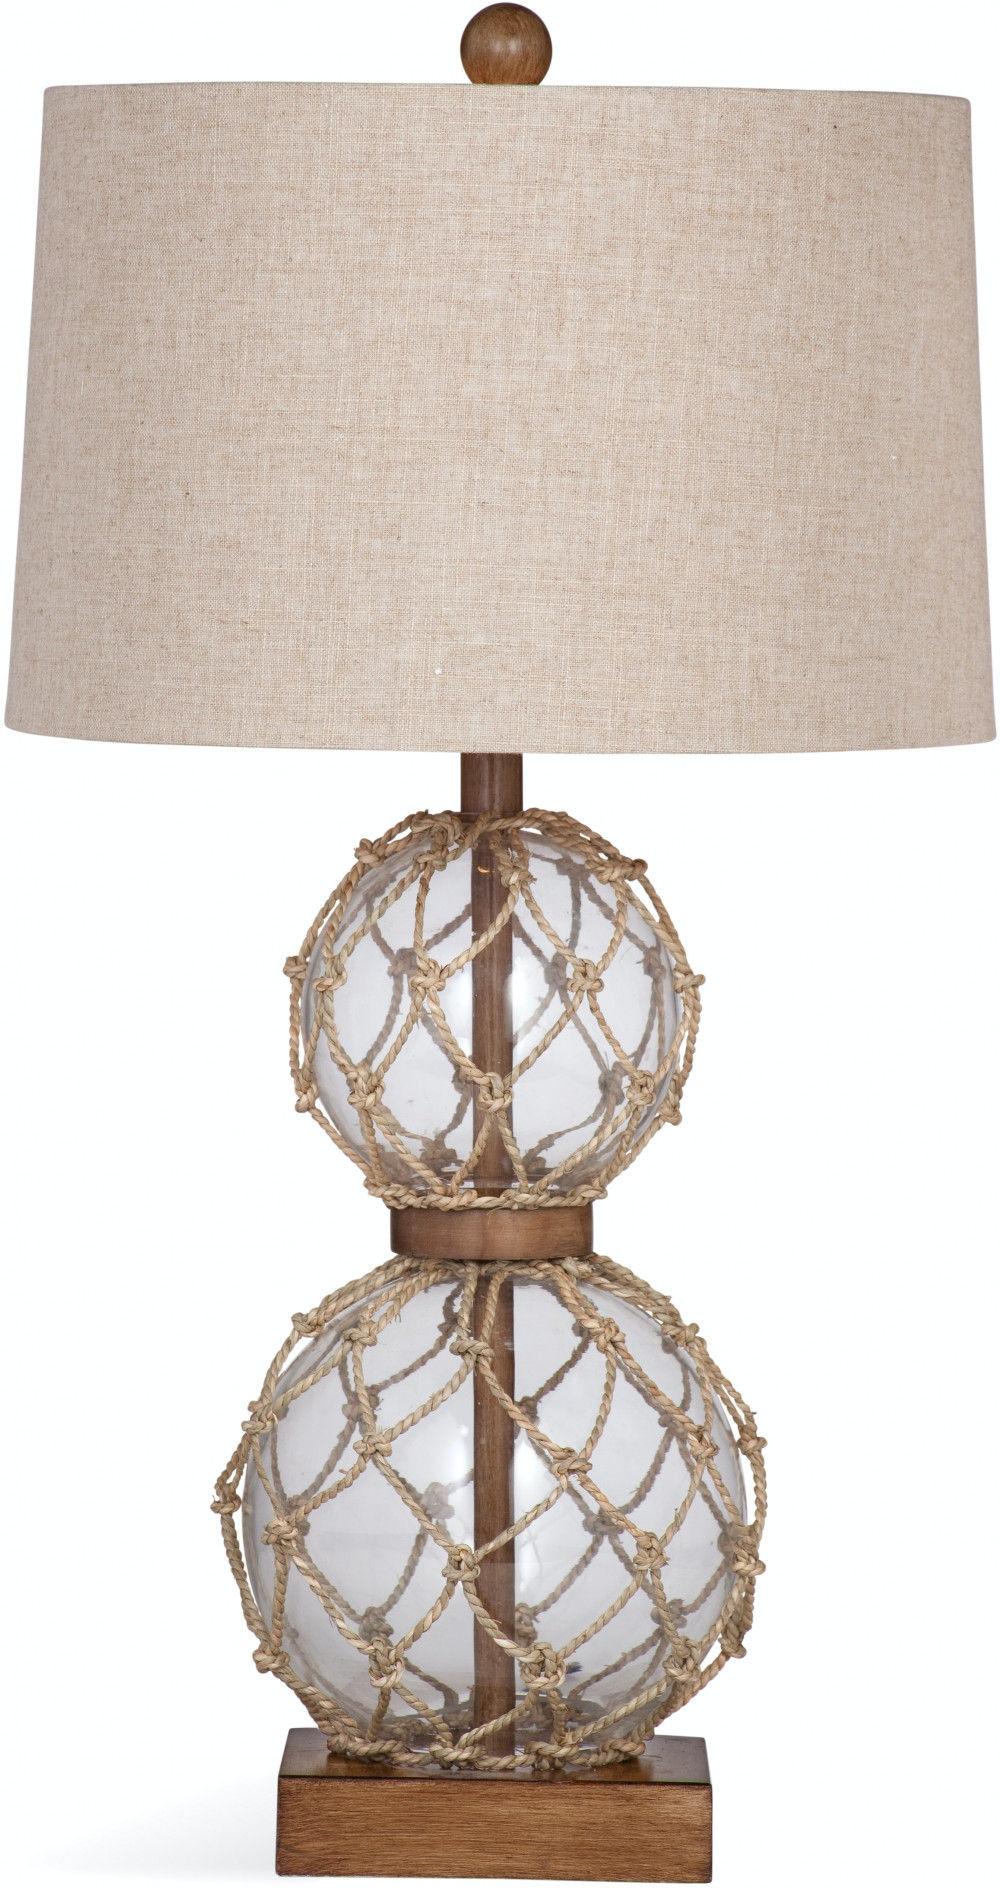 Seaside Table Lamp Btml3107t